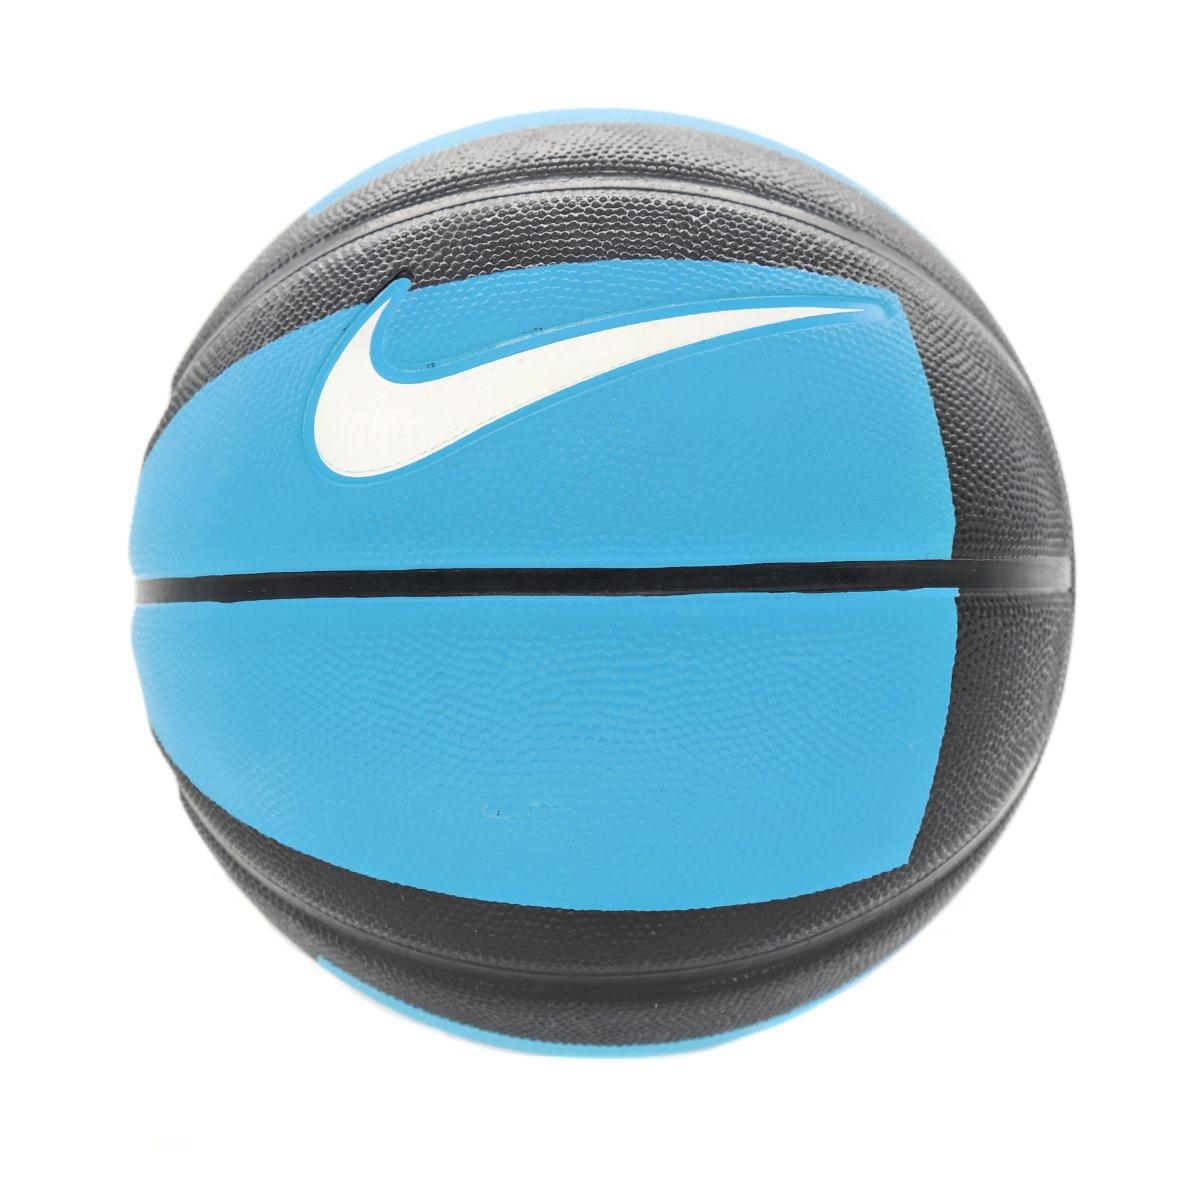 the latest 63f85 b4bcf balón pelota nike lebron xiii playground original nuevo. Cargando zoom.